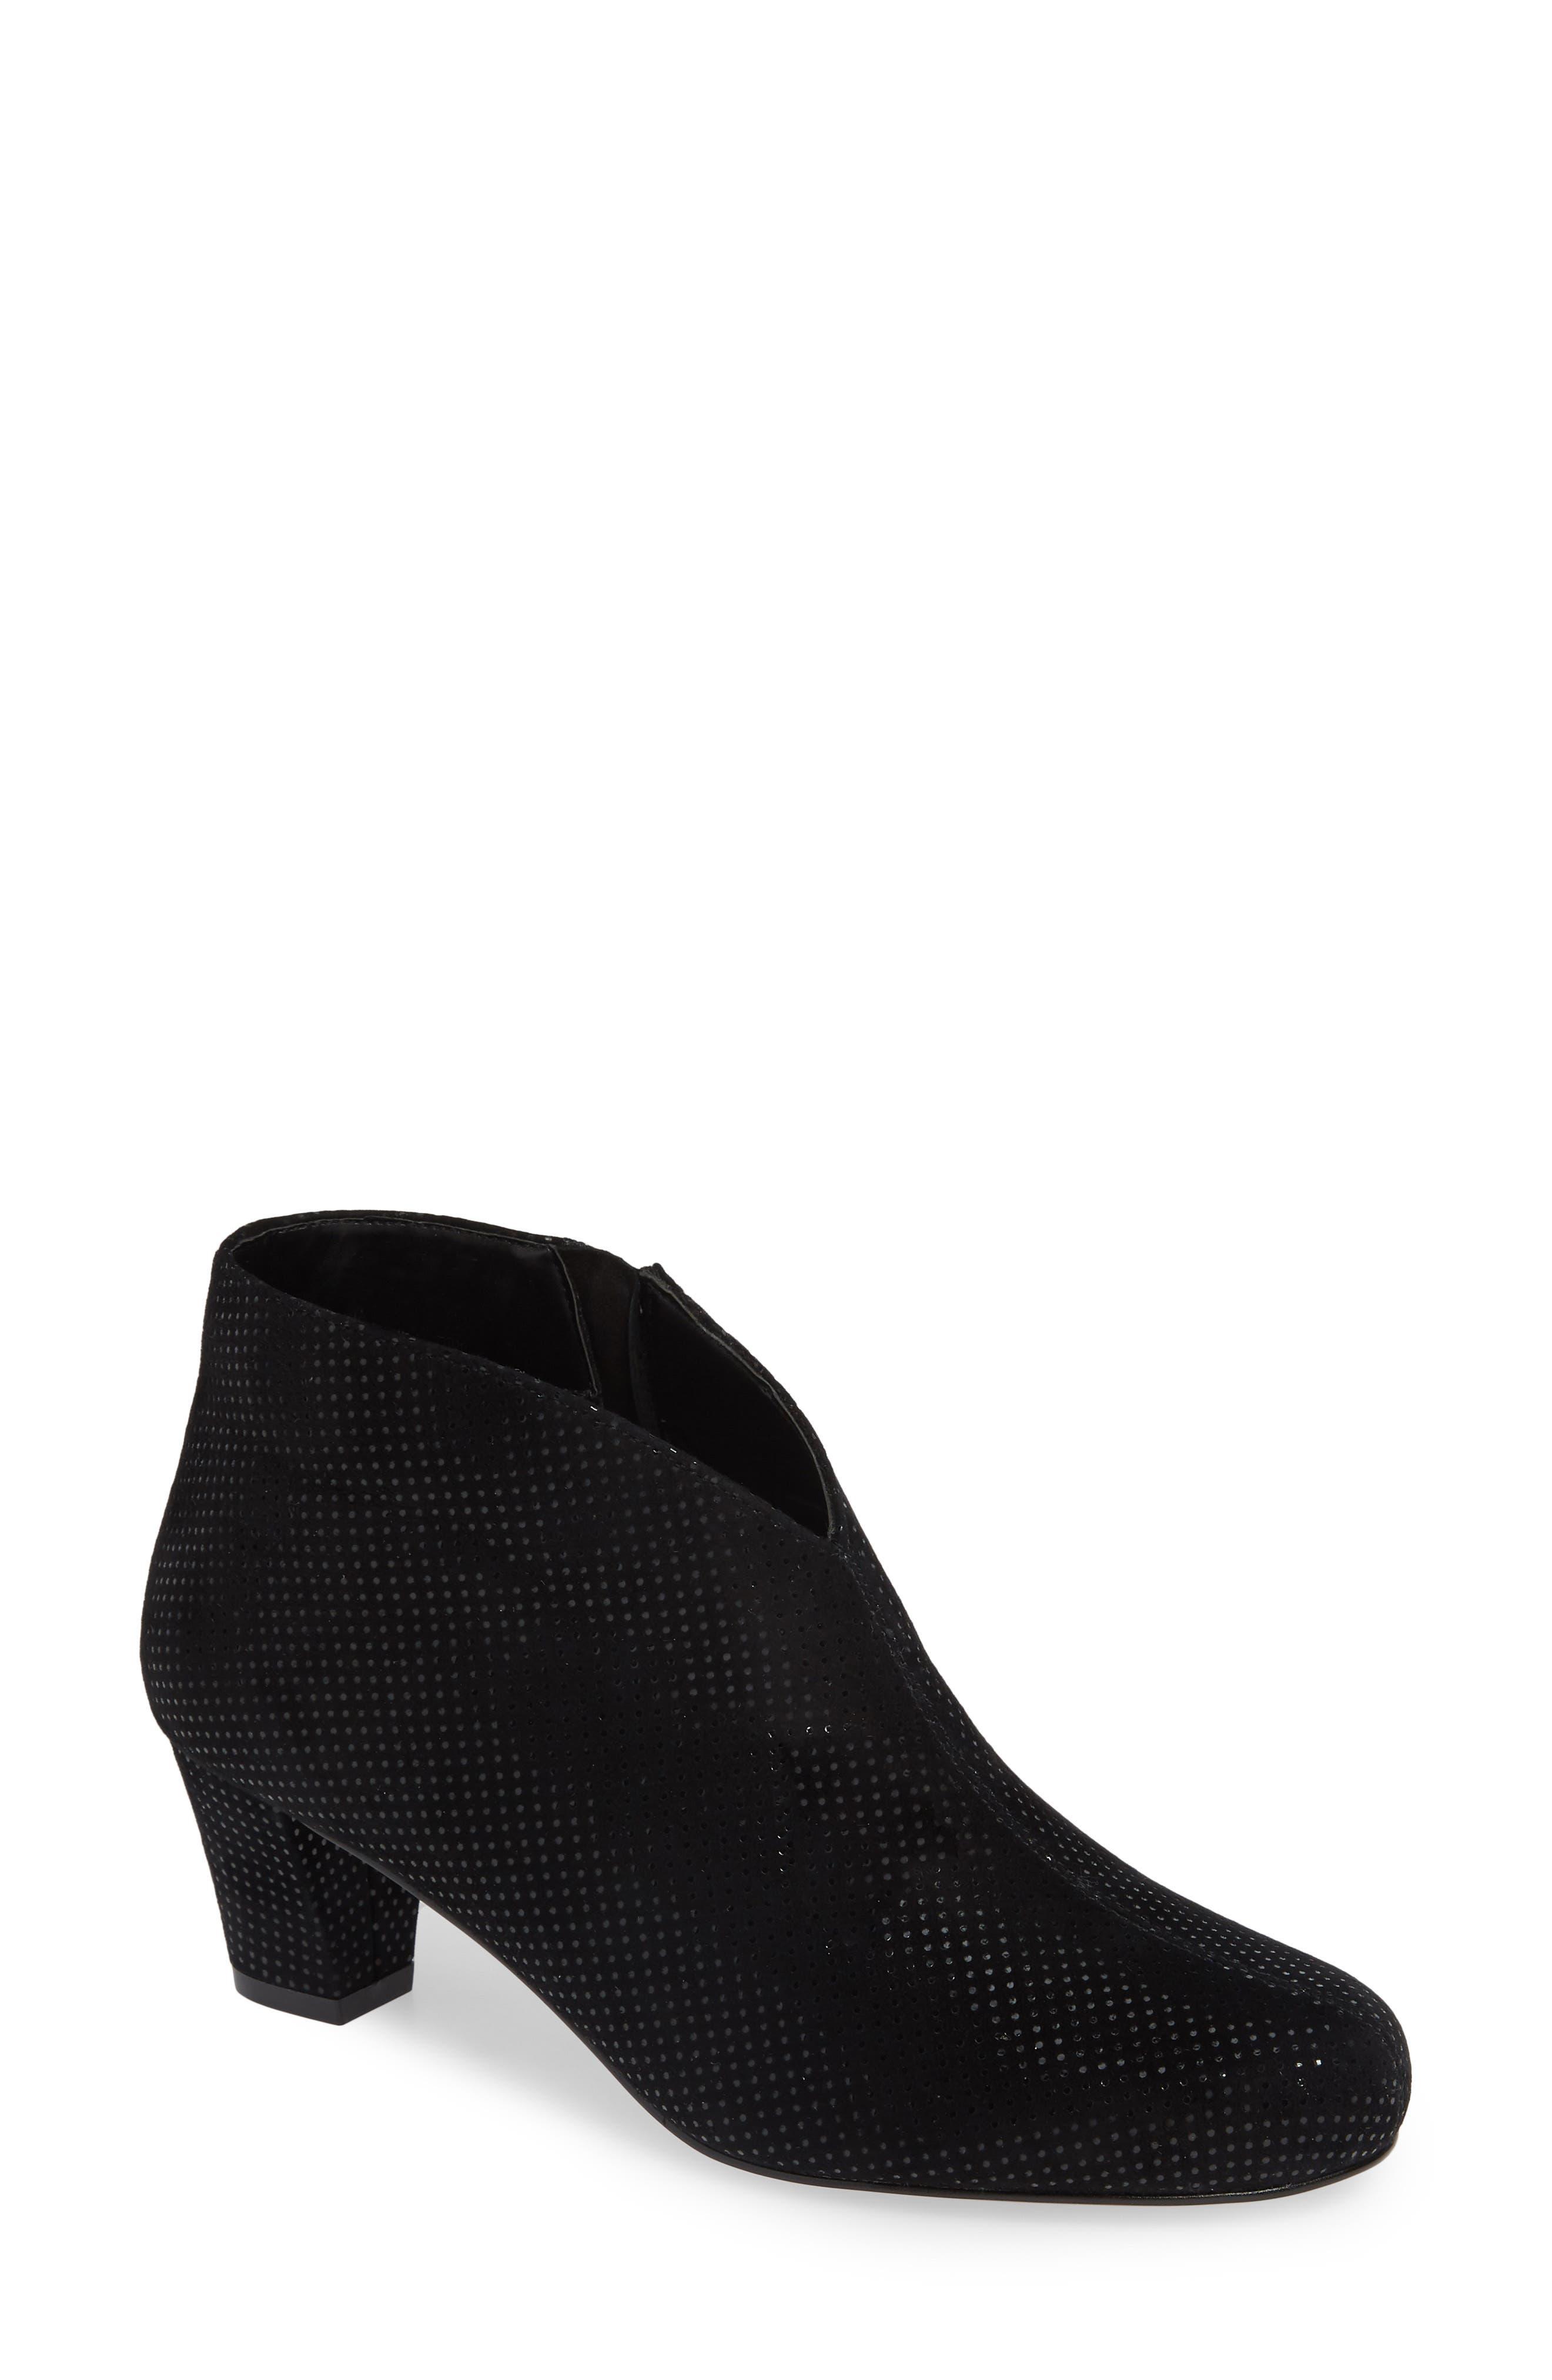 DAVID TATE Fame Boot, Main, color, BLACK SUEDE